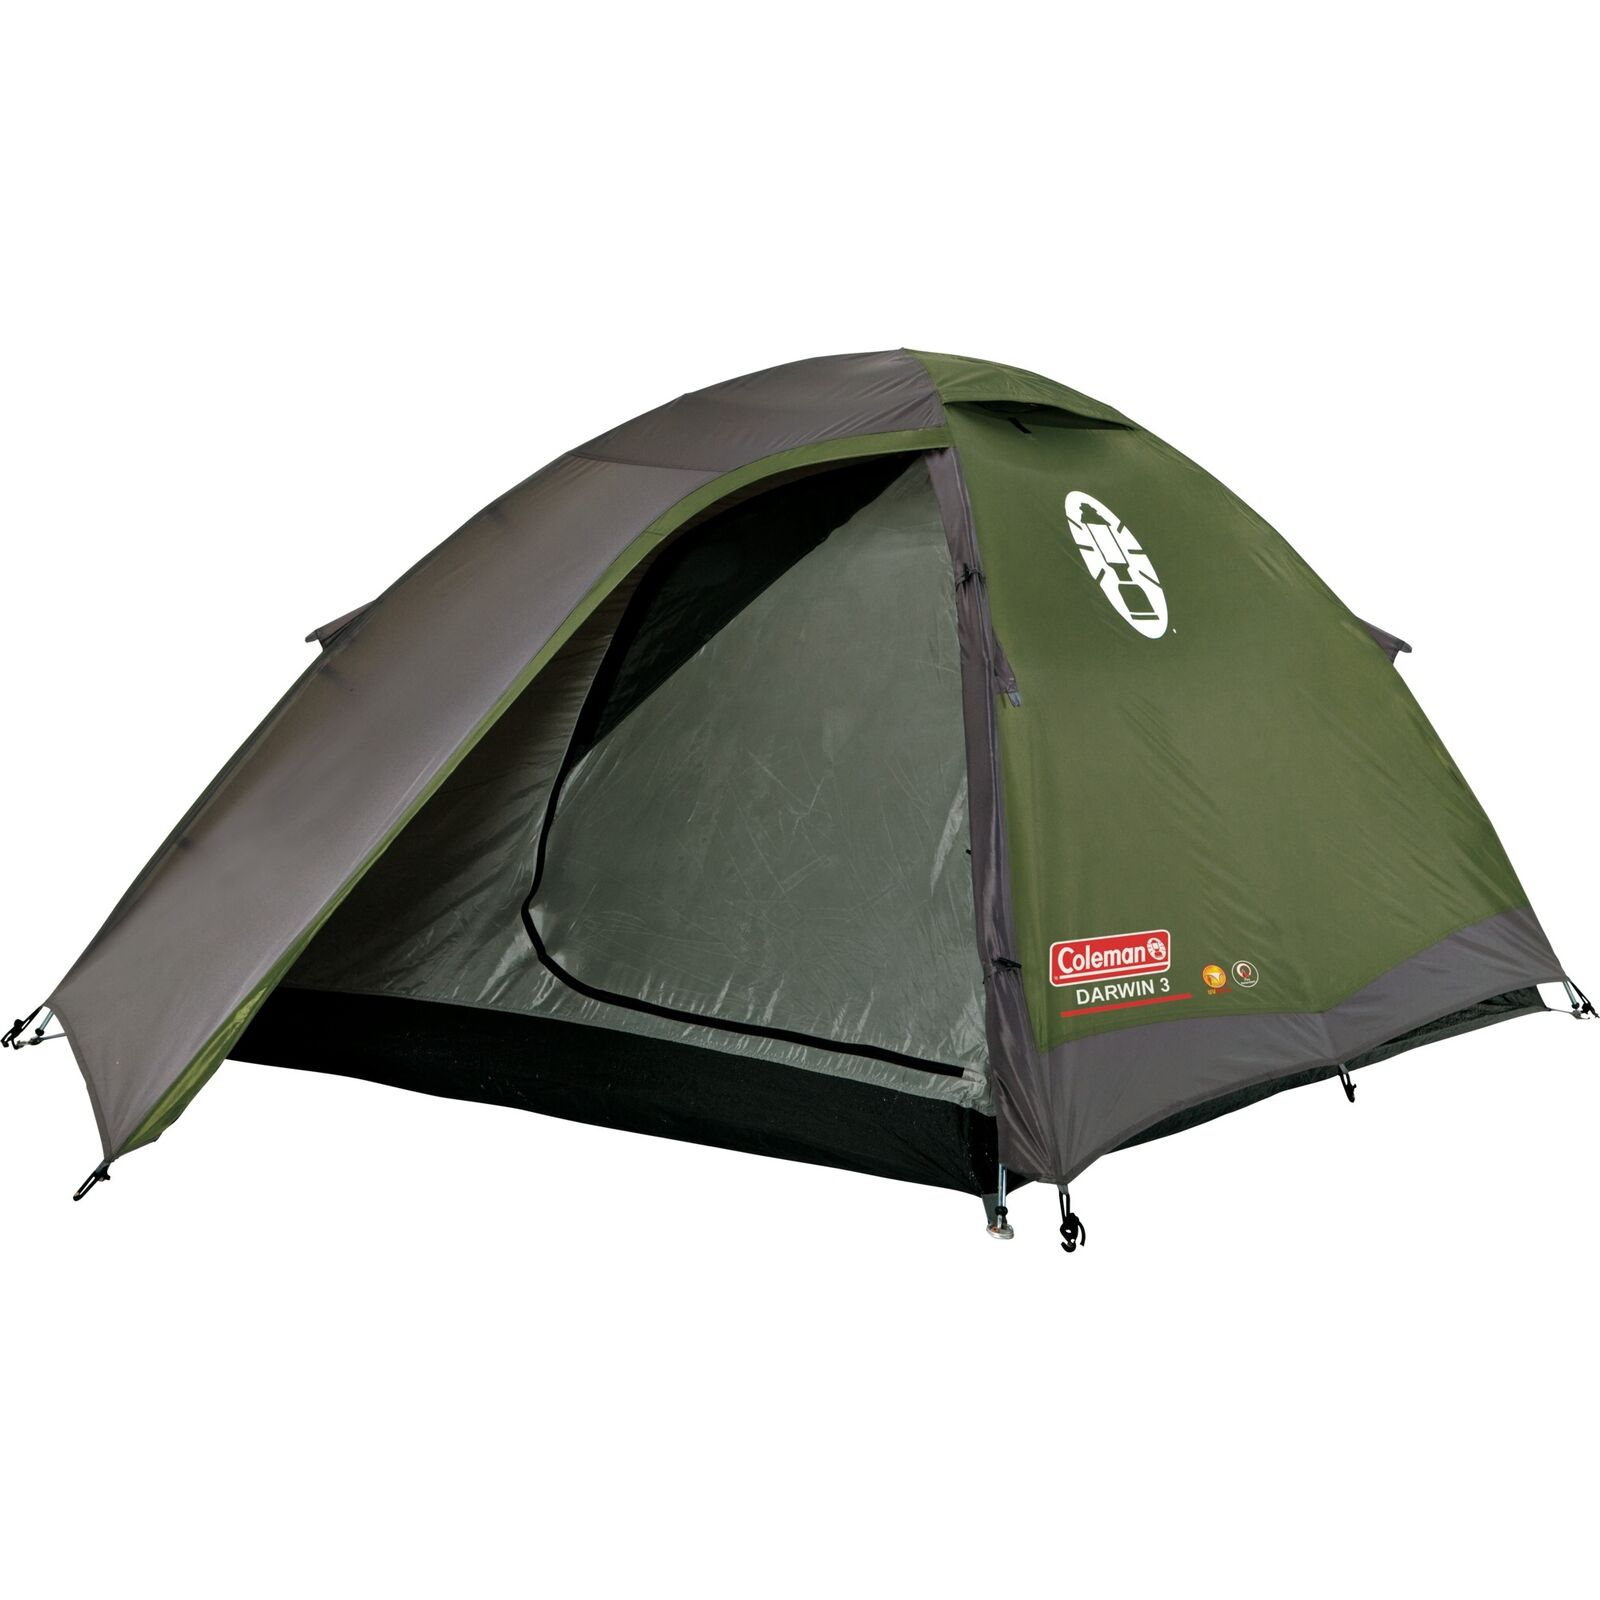 Coleman 3-Personen-Kuppelzelt DARWIN 3 Zelt dunkelgrün